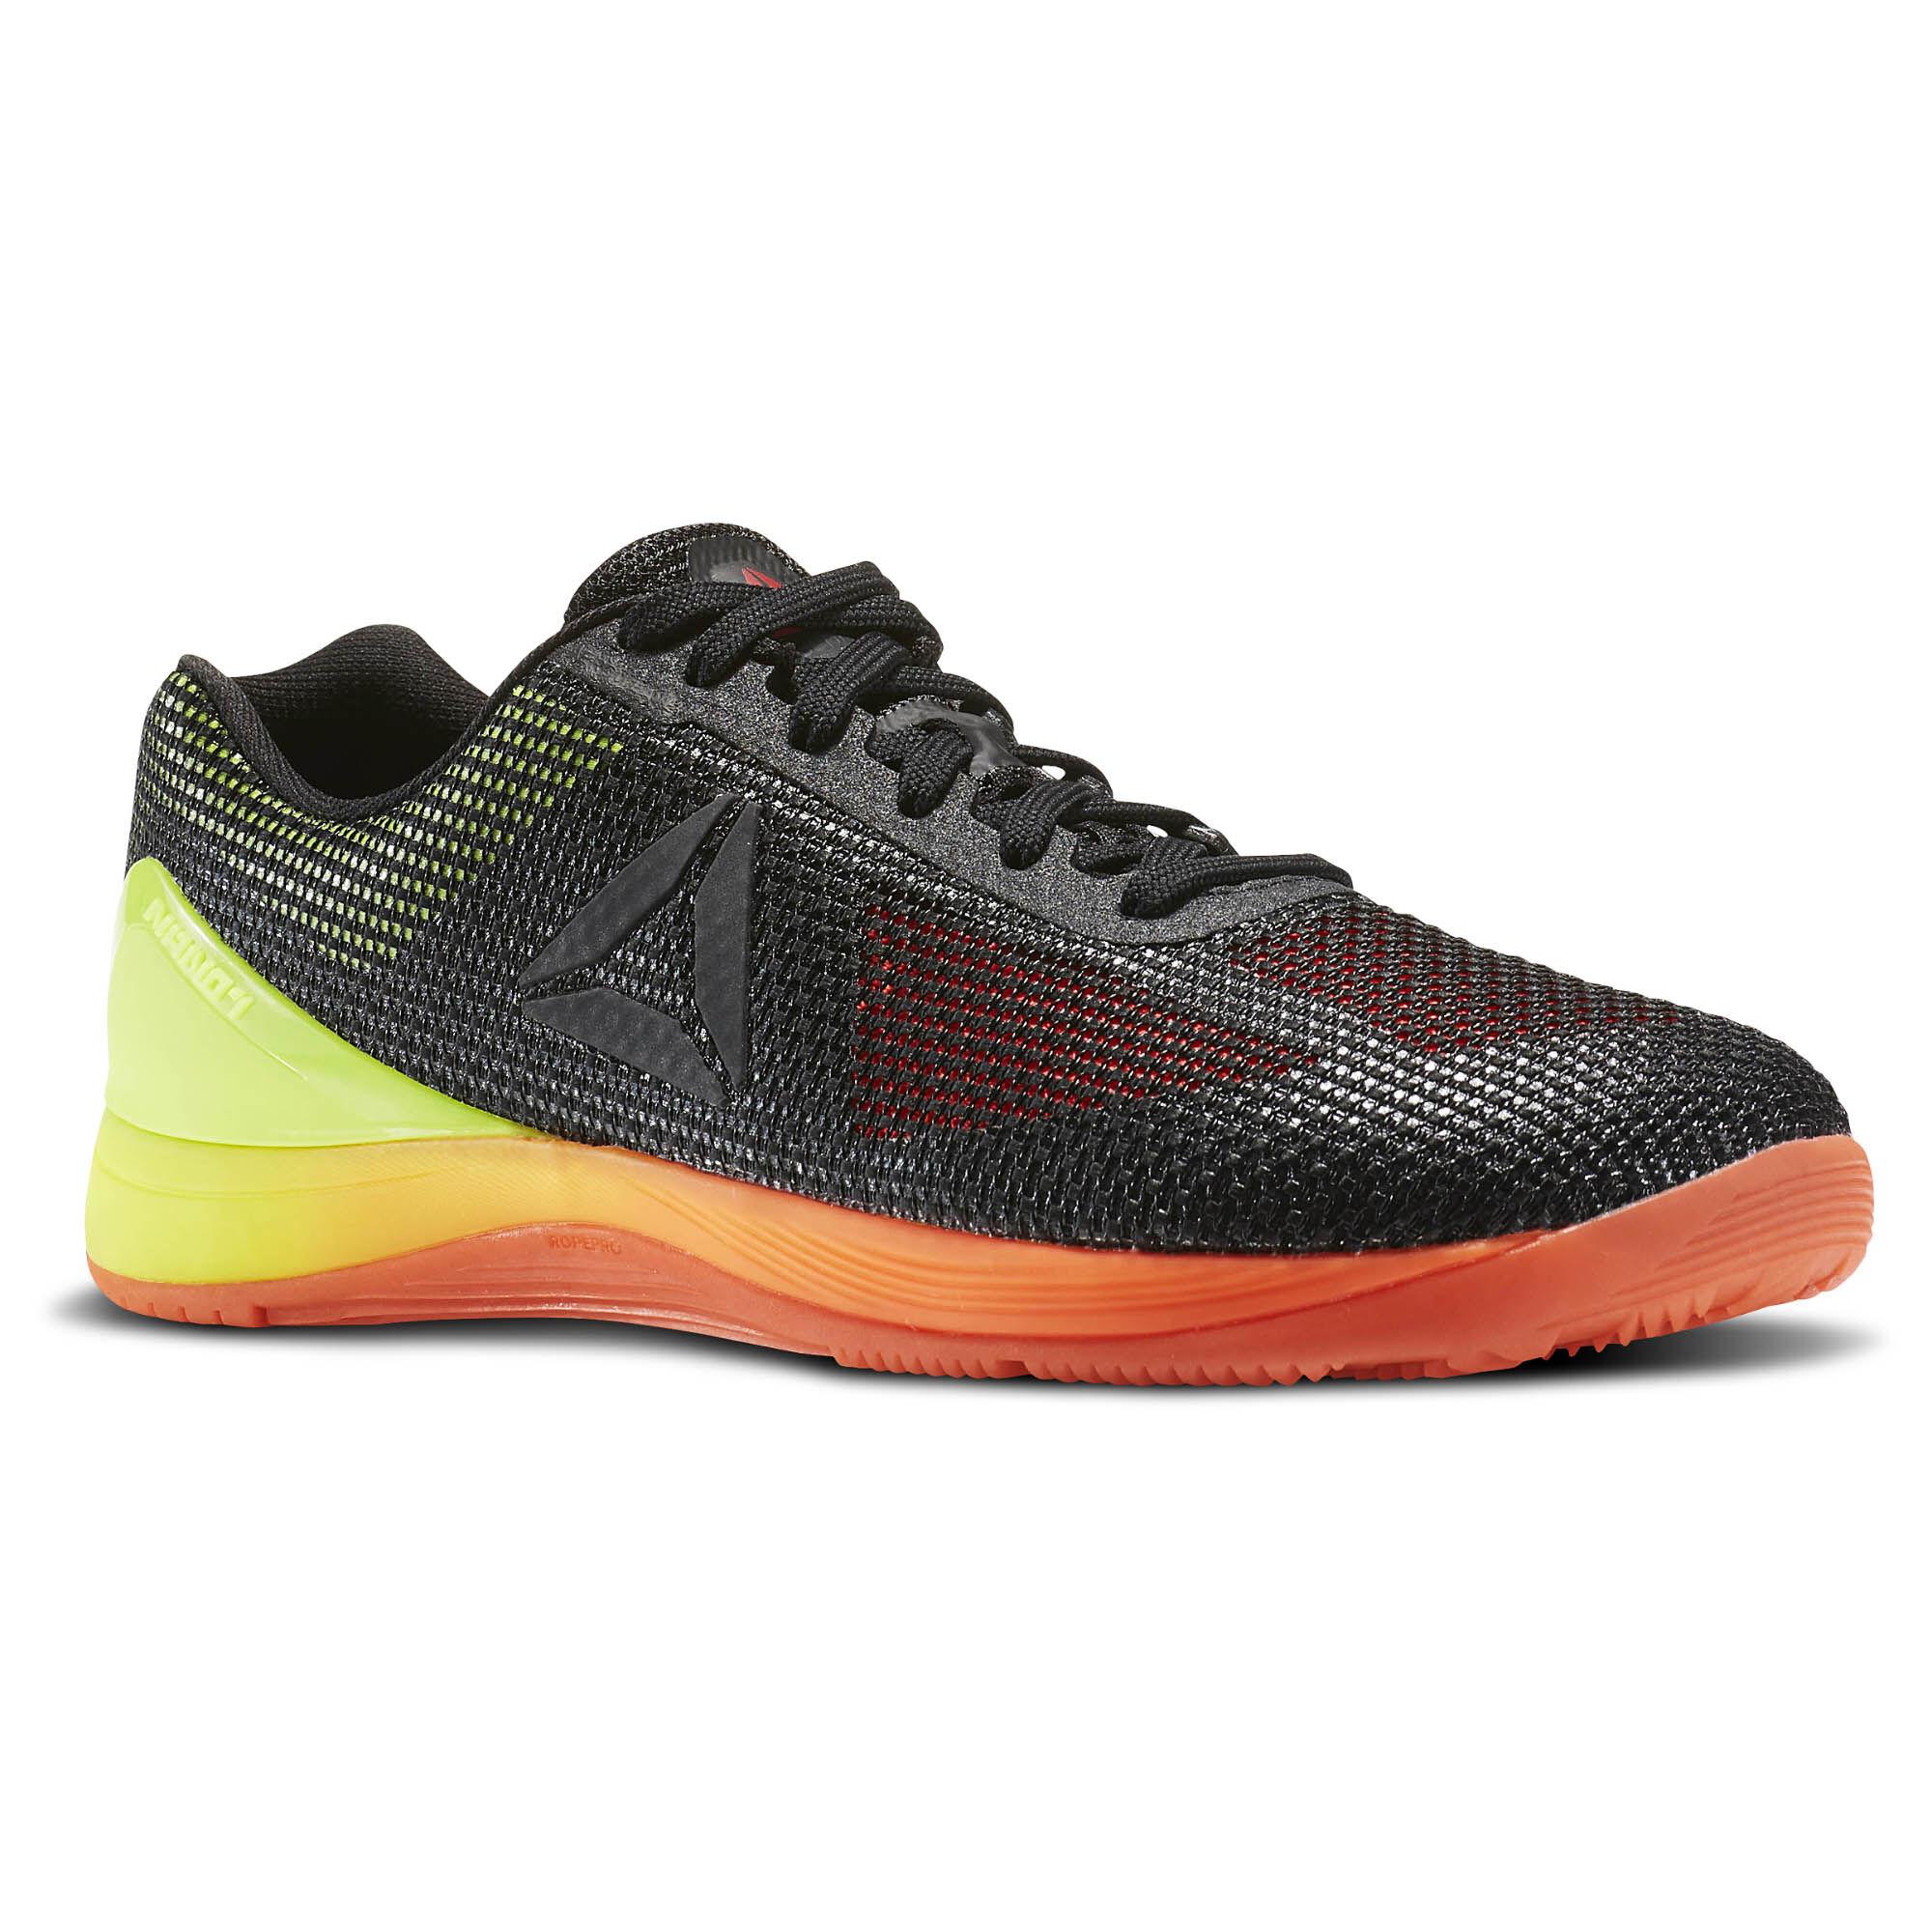 Buy buy puma running shoes online > OFF30% Discounts